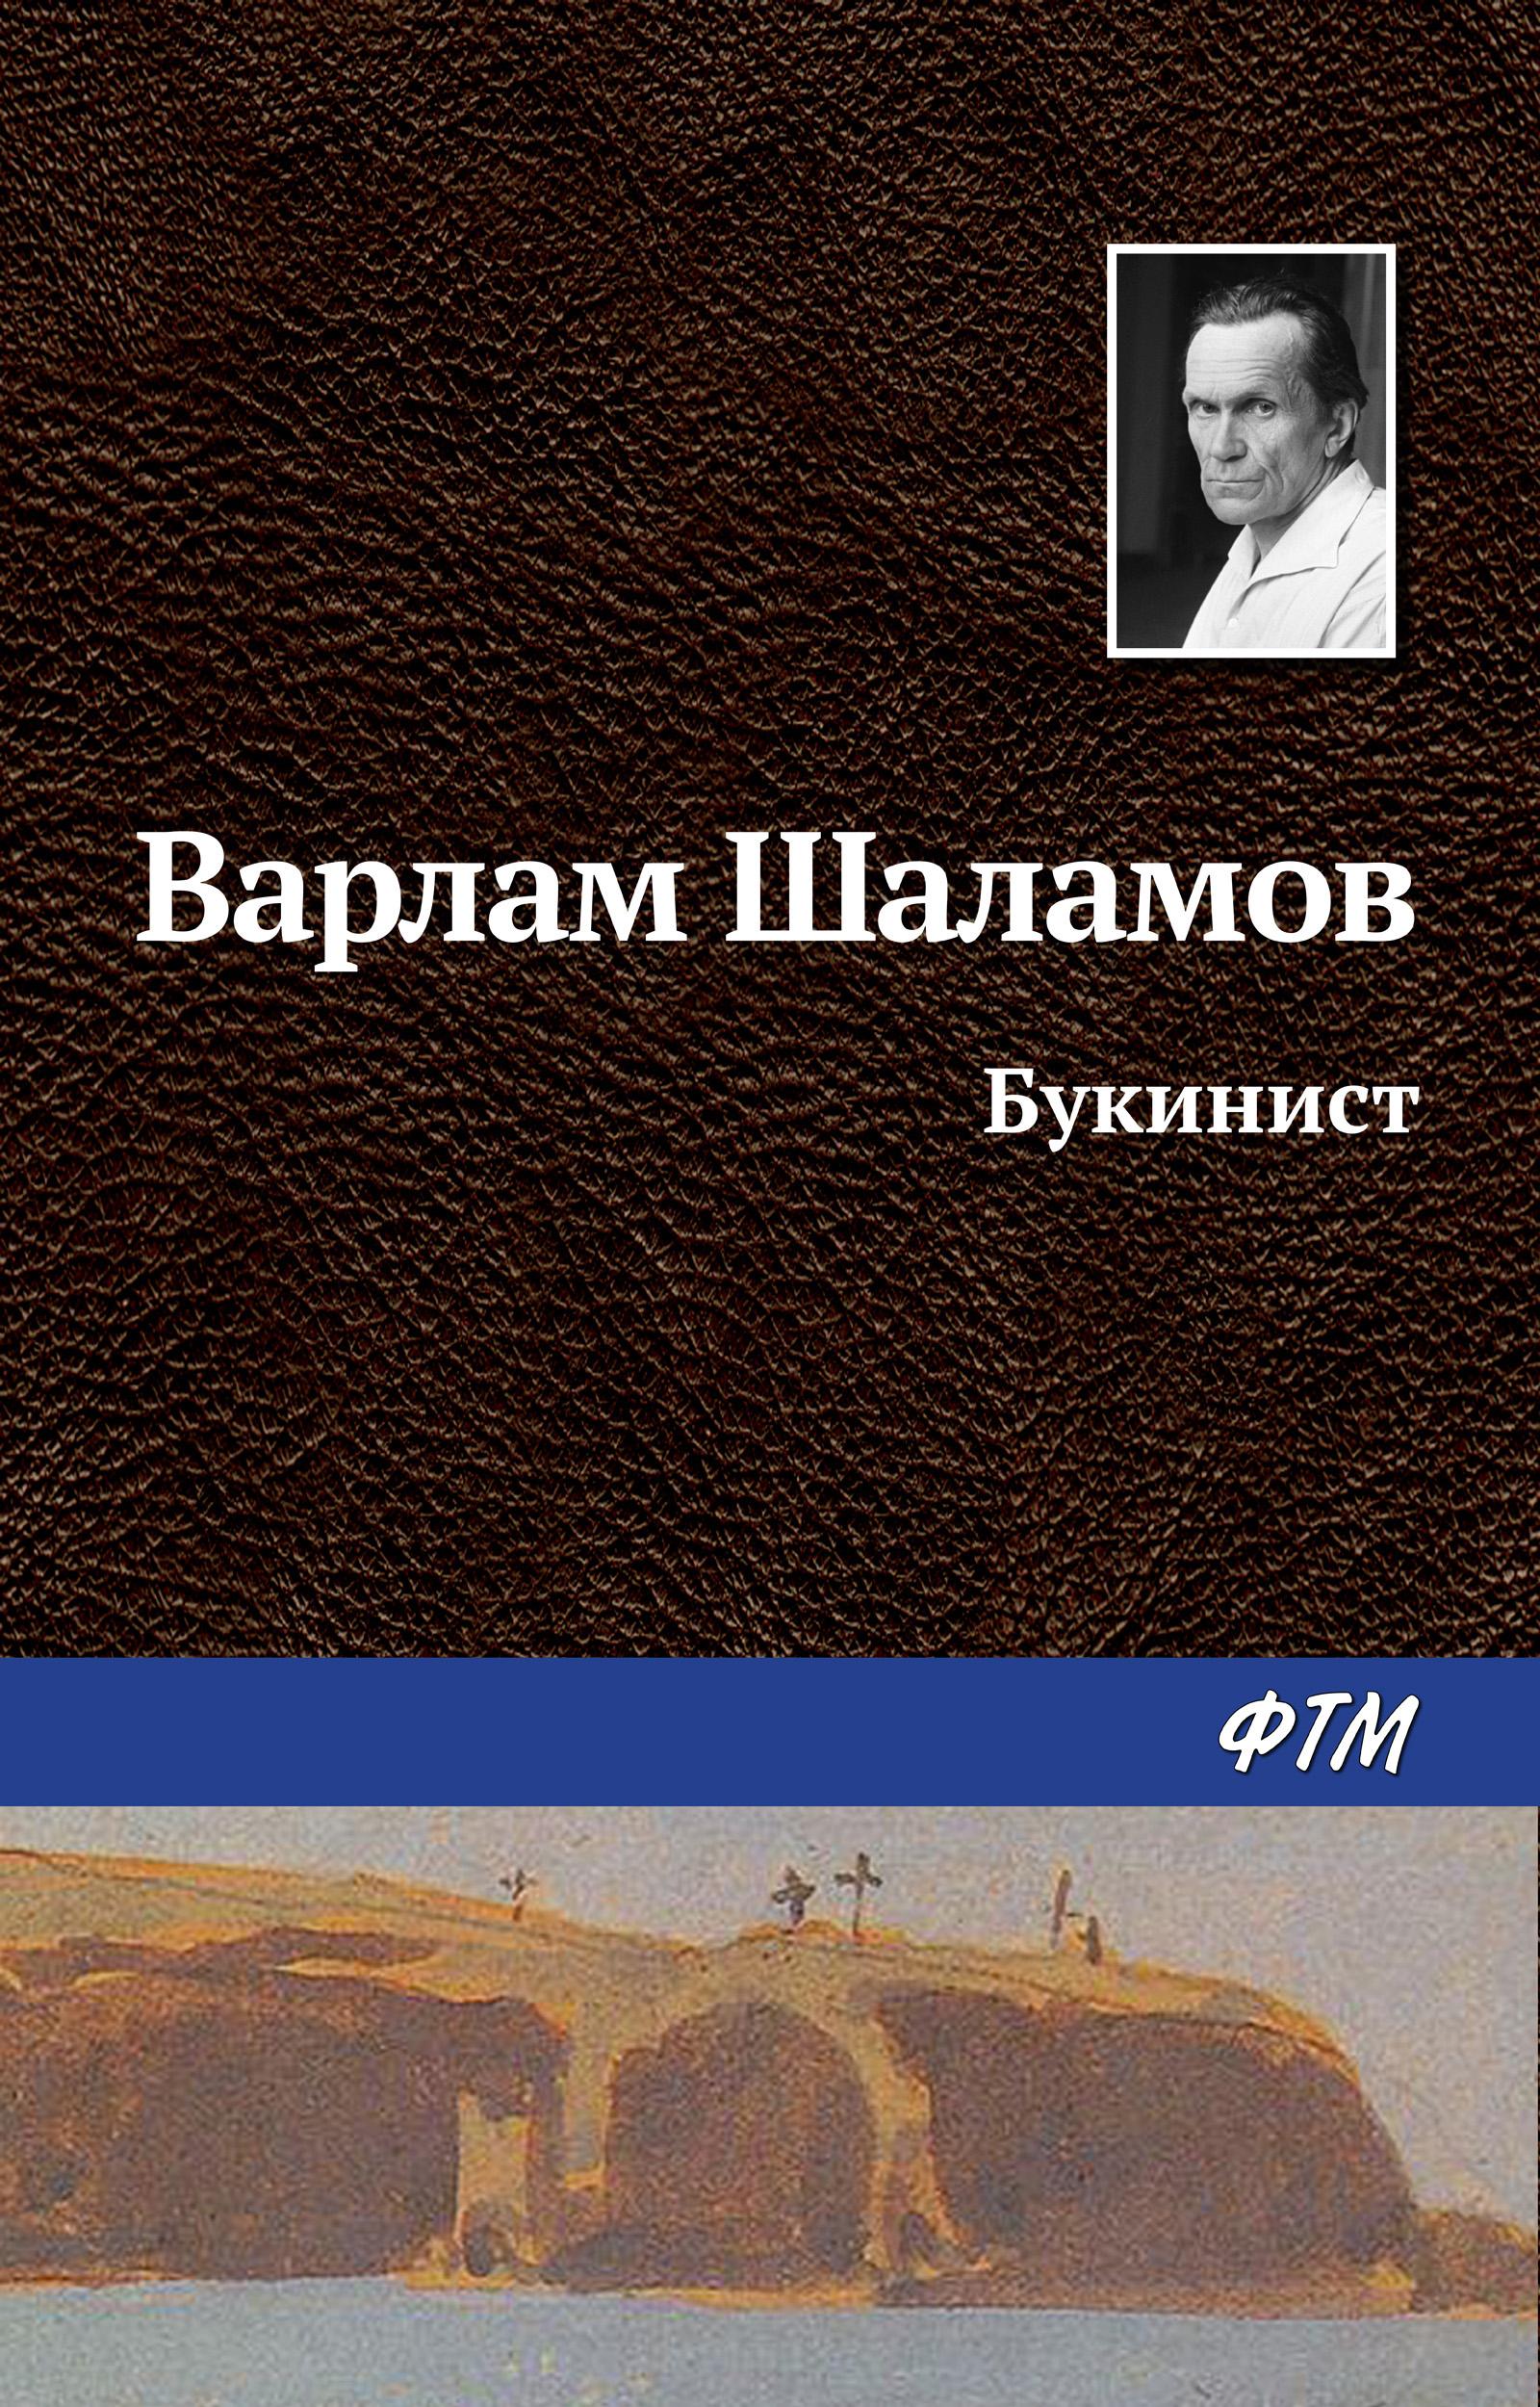 Варлам Шаламов Букинист